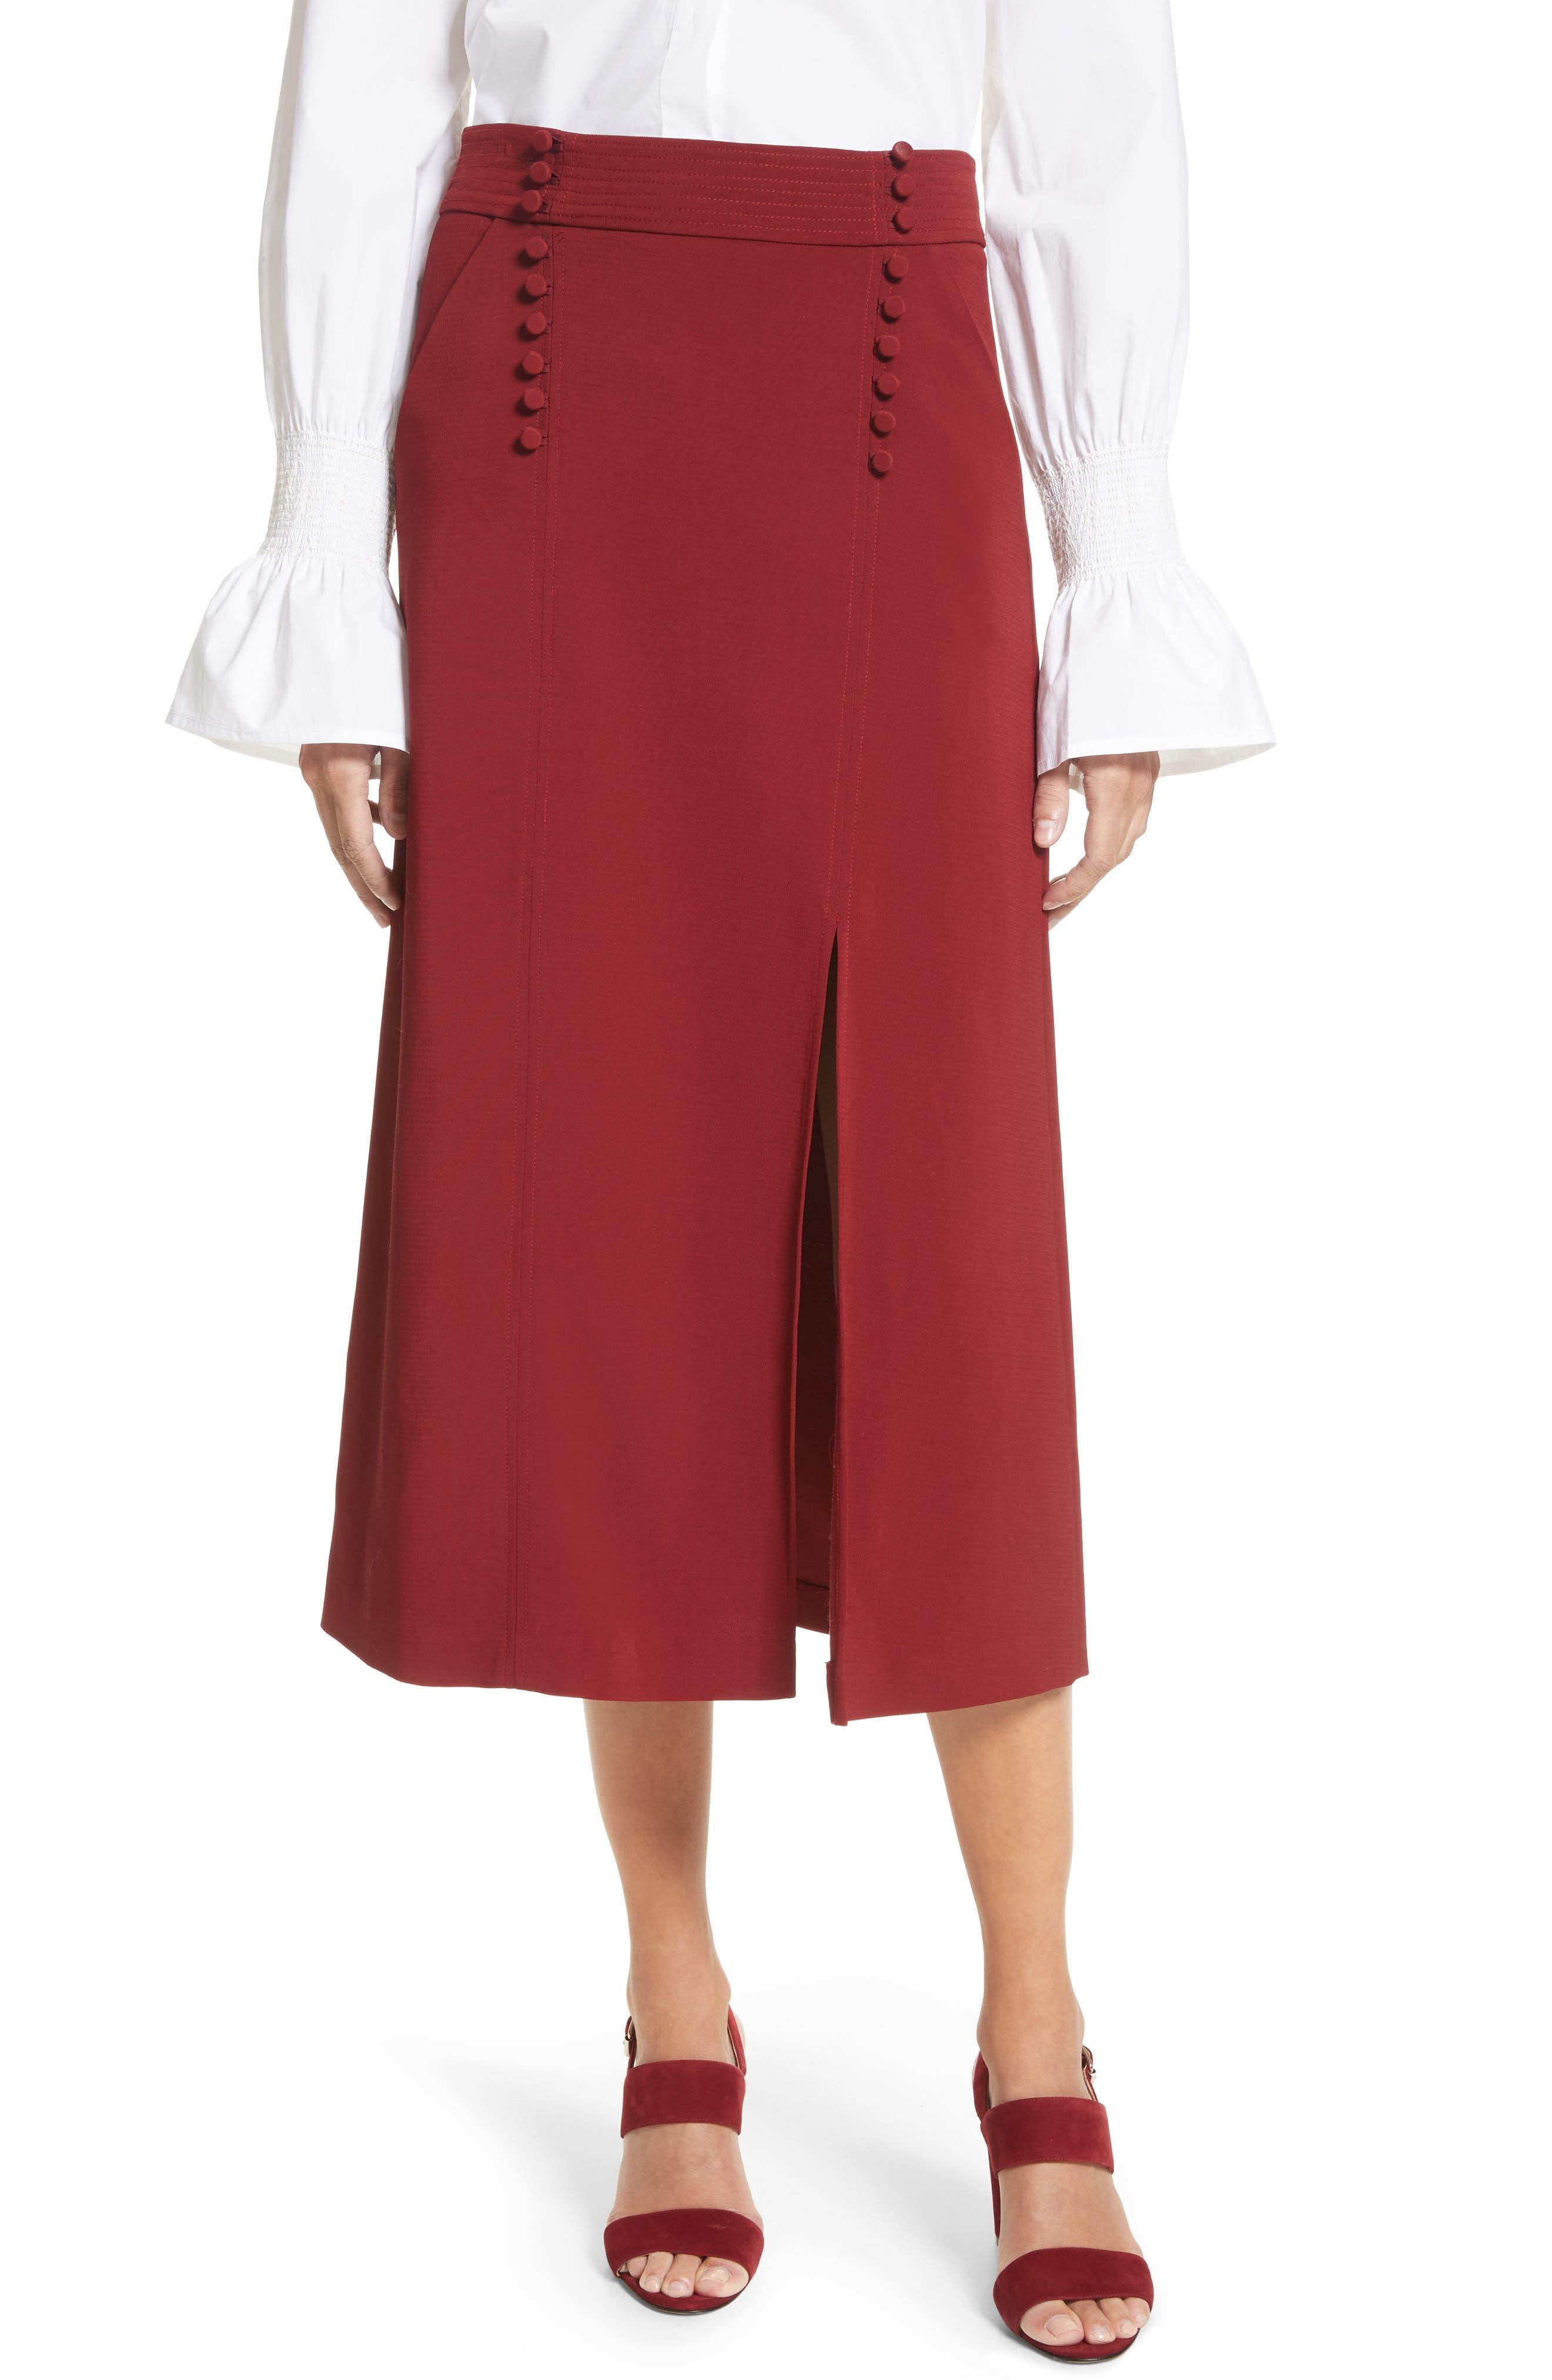 Alternate Image 1 Selected - A.L.C. Sydney Skirt